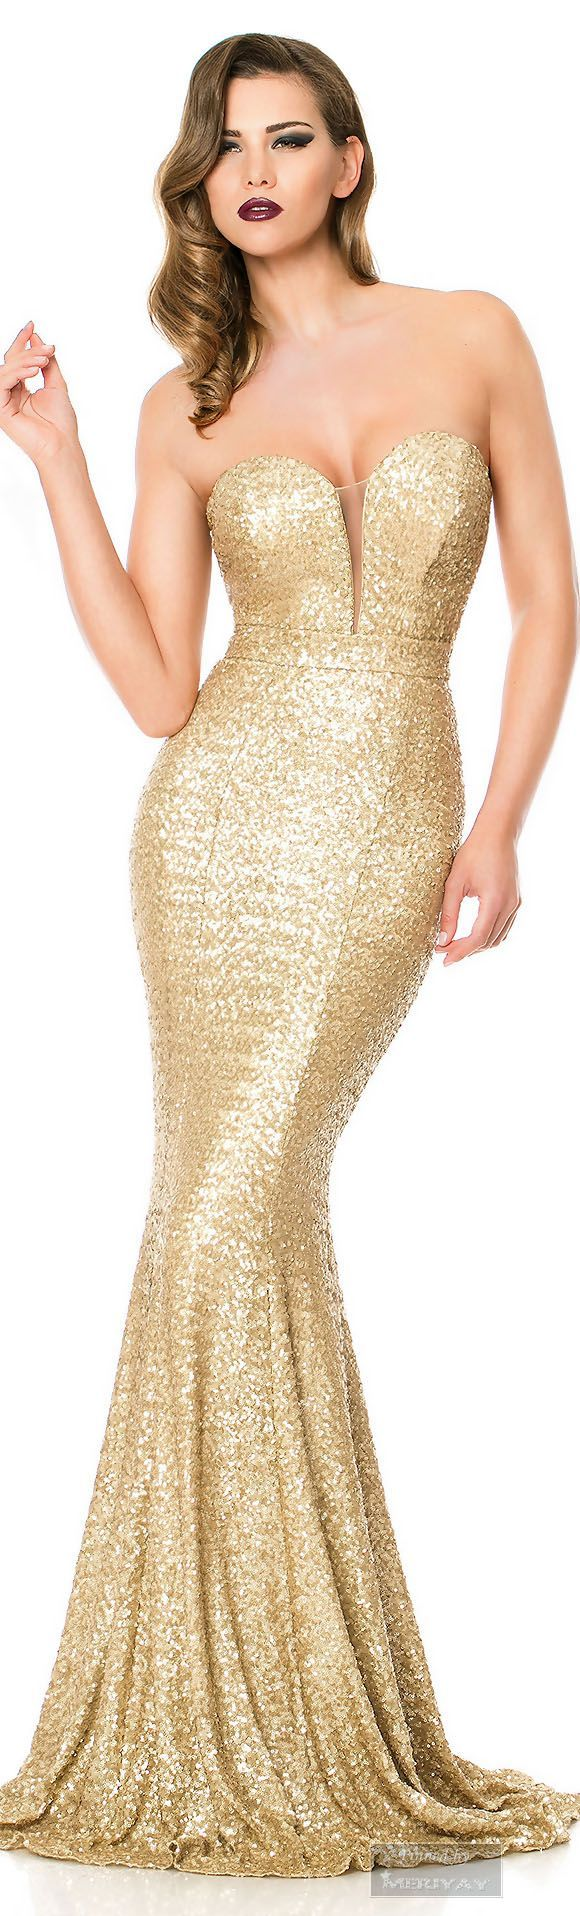 229 best - Godmother Dress - images on Pinterest   Clothes ...